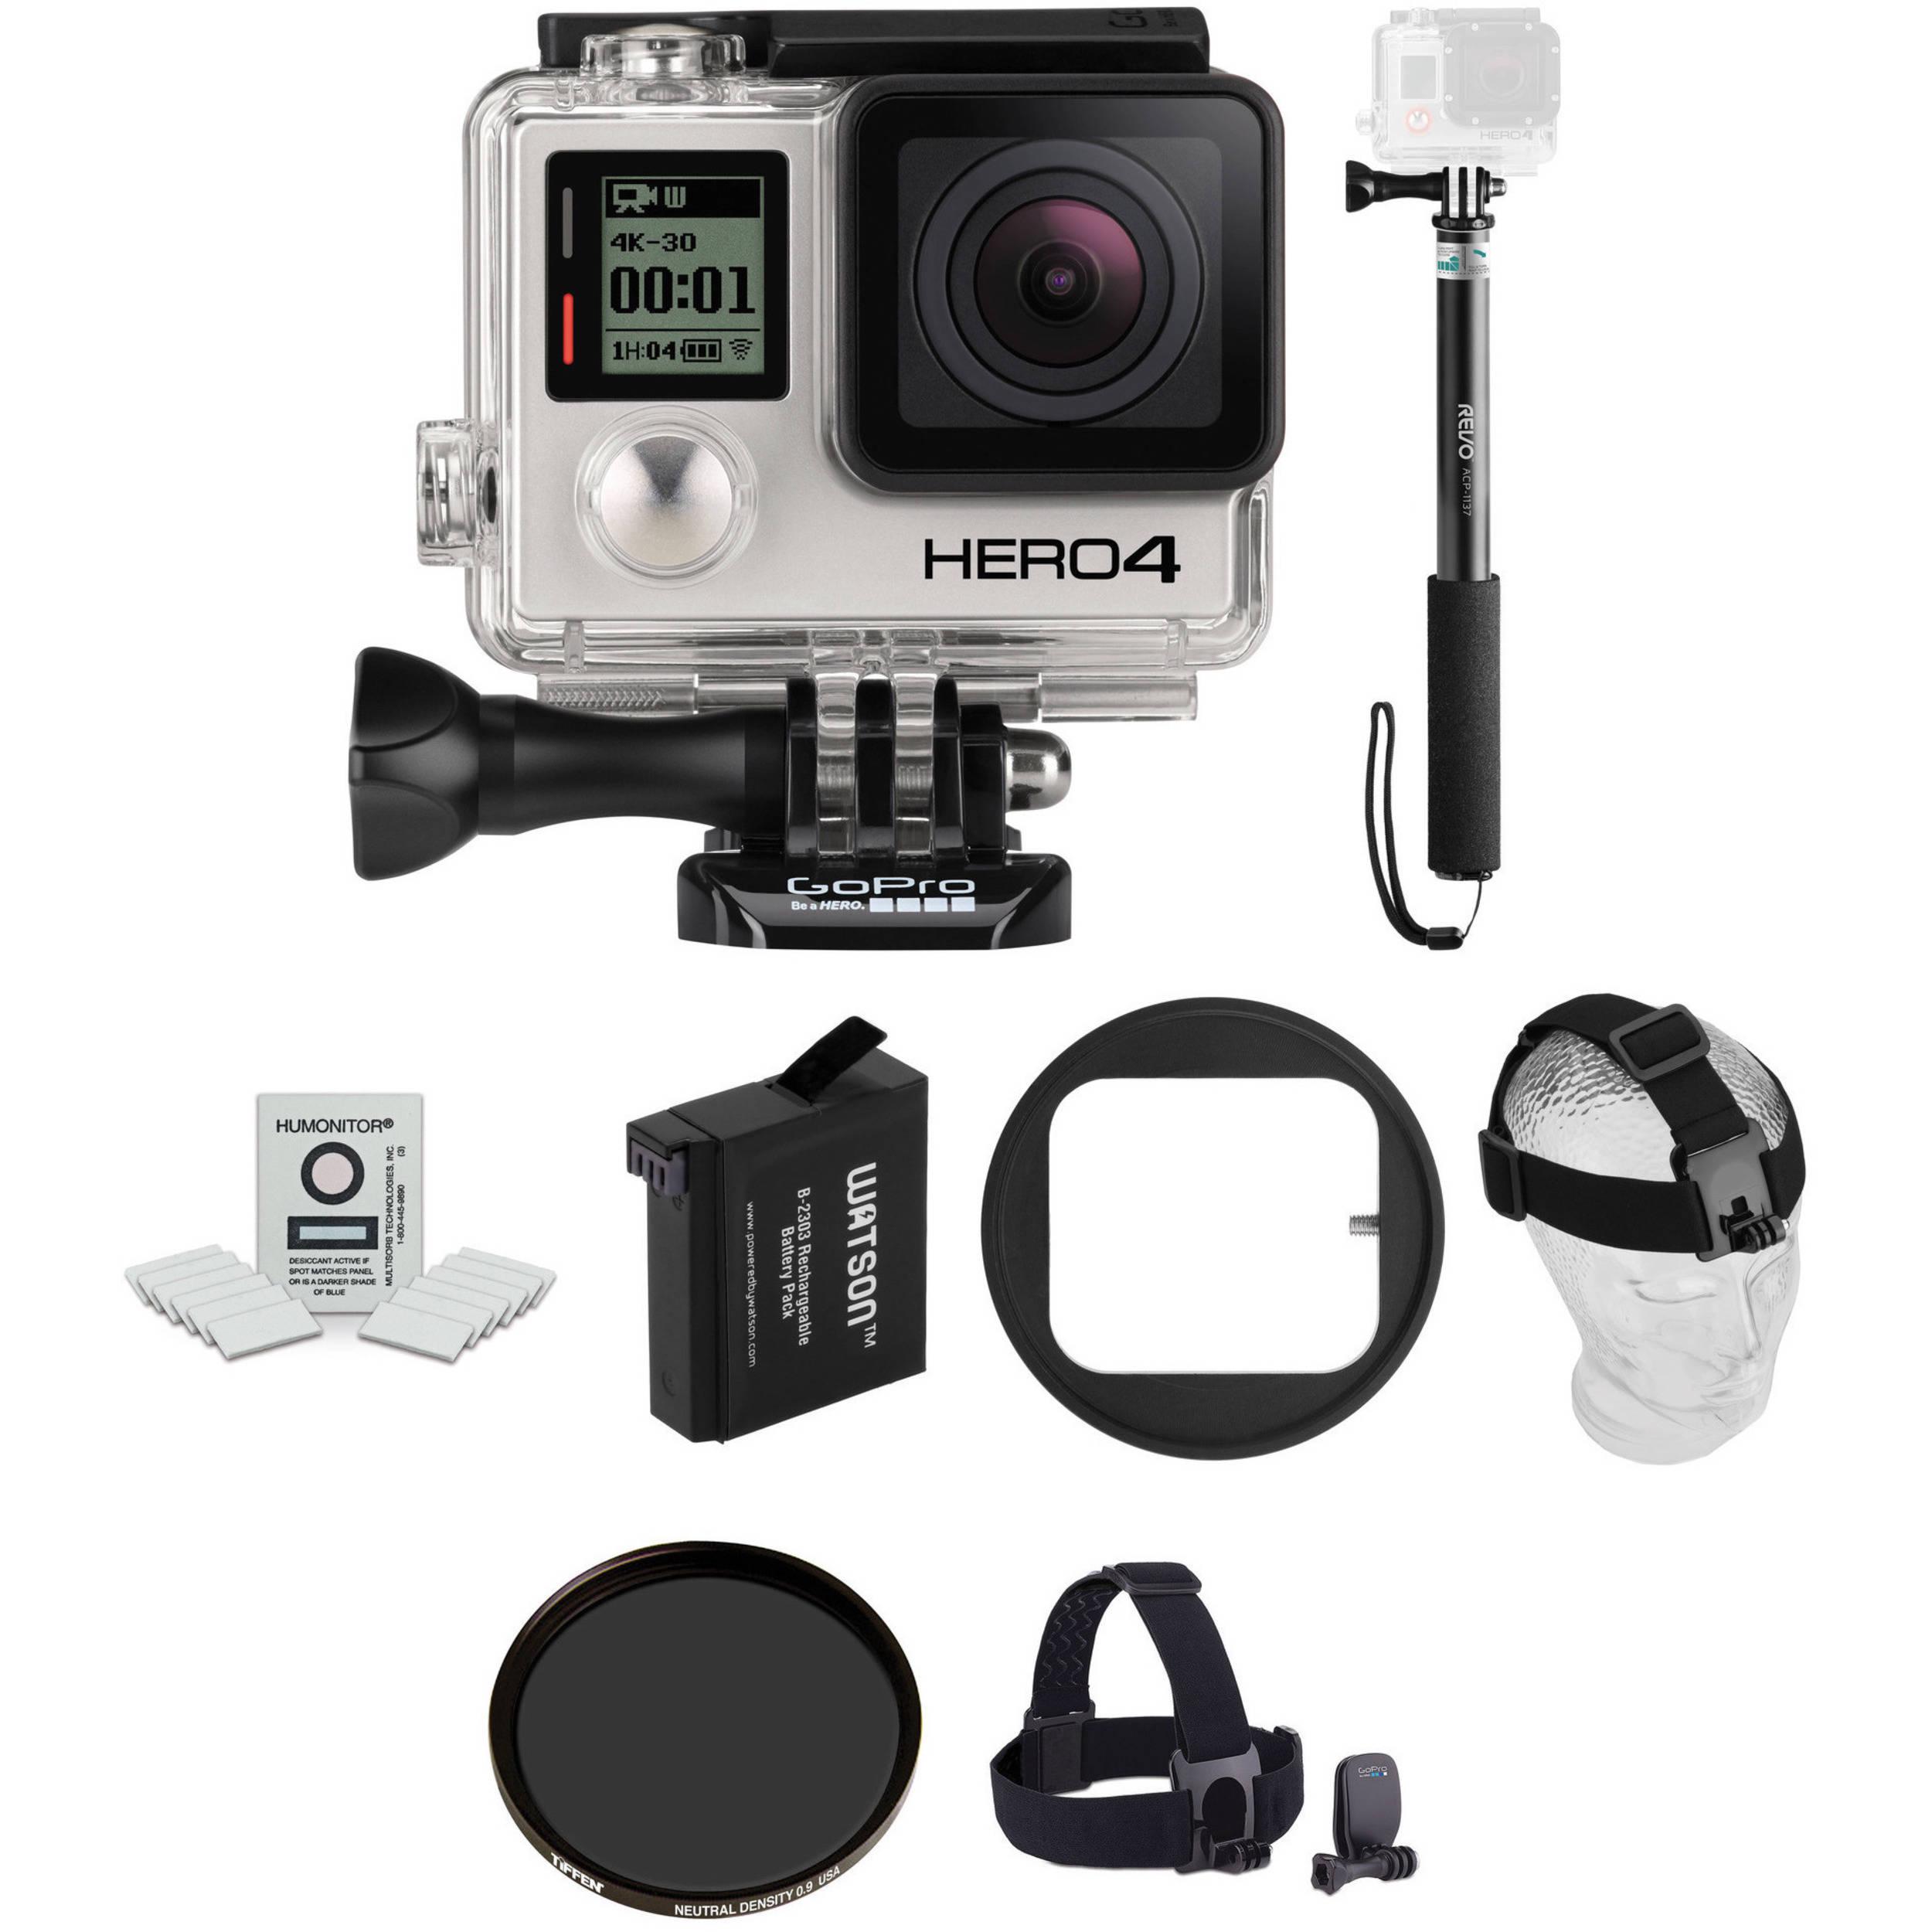 GoPro HERO4 Black Ski Kit B&H Photo Video